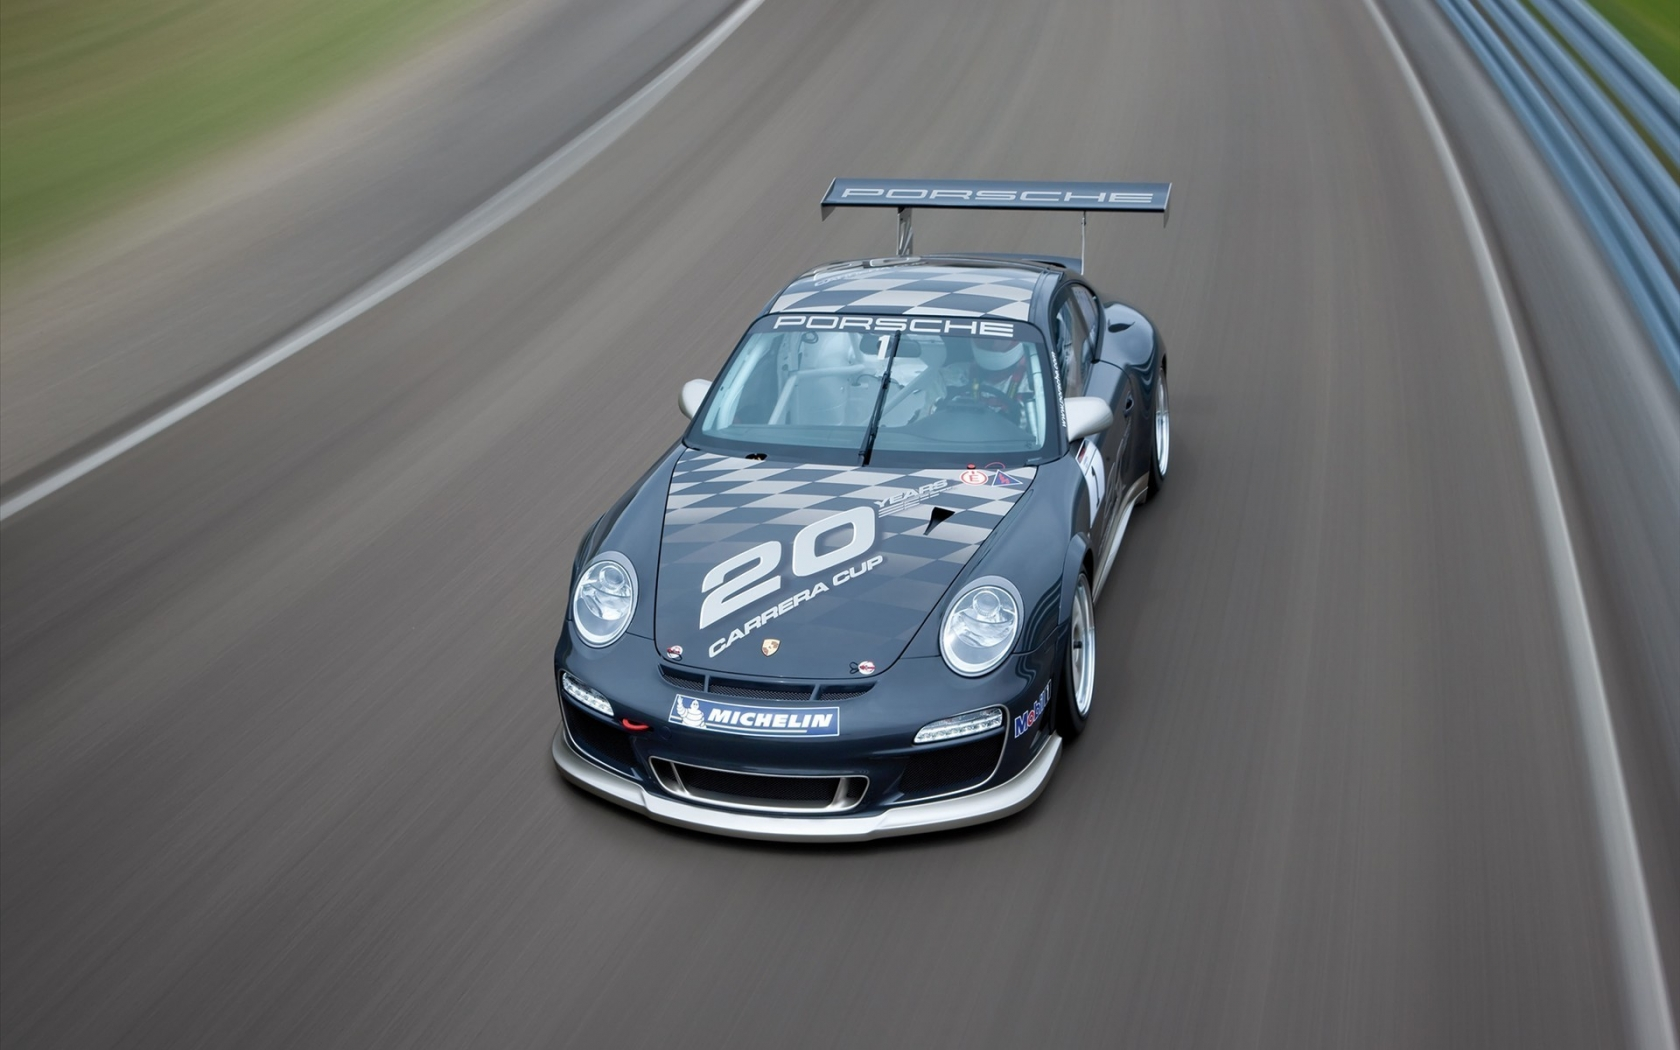 Auto Porsche negro - 1680x1050